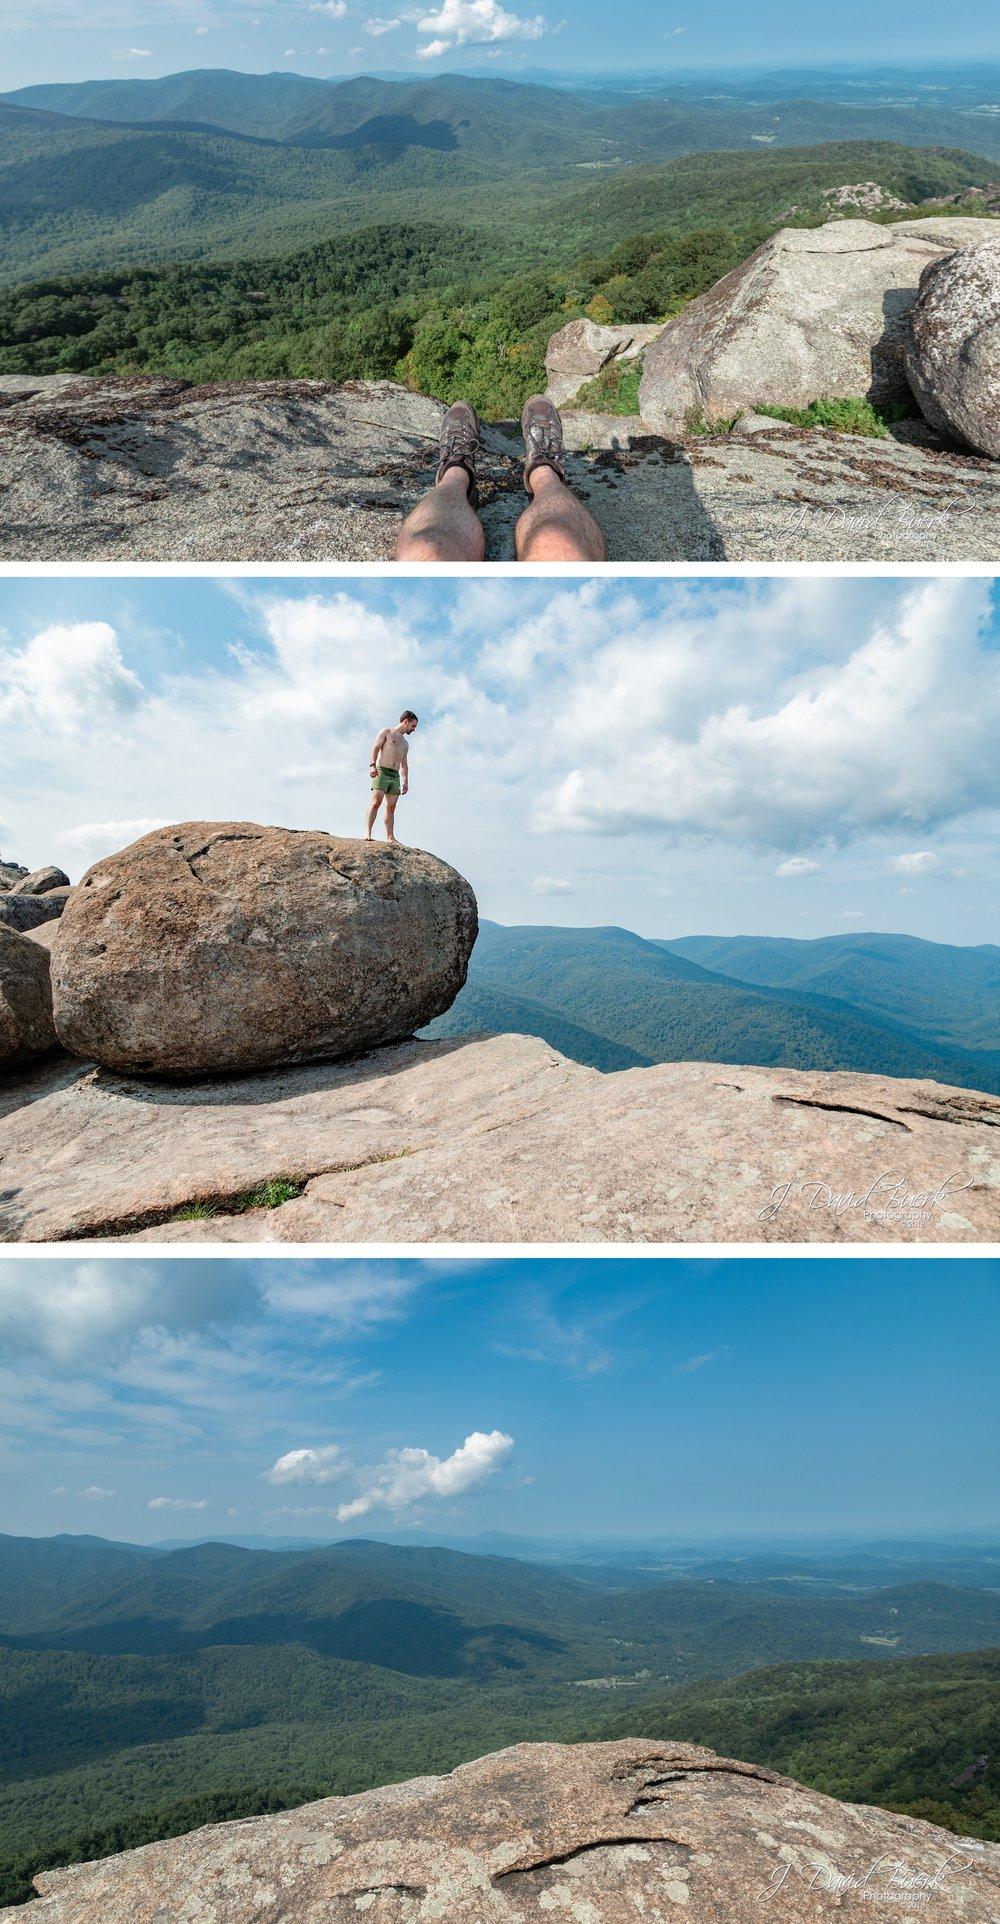 20180826 - Old Rag Mountain August 2018 8.jpg